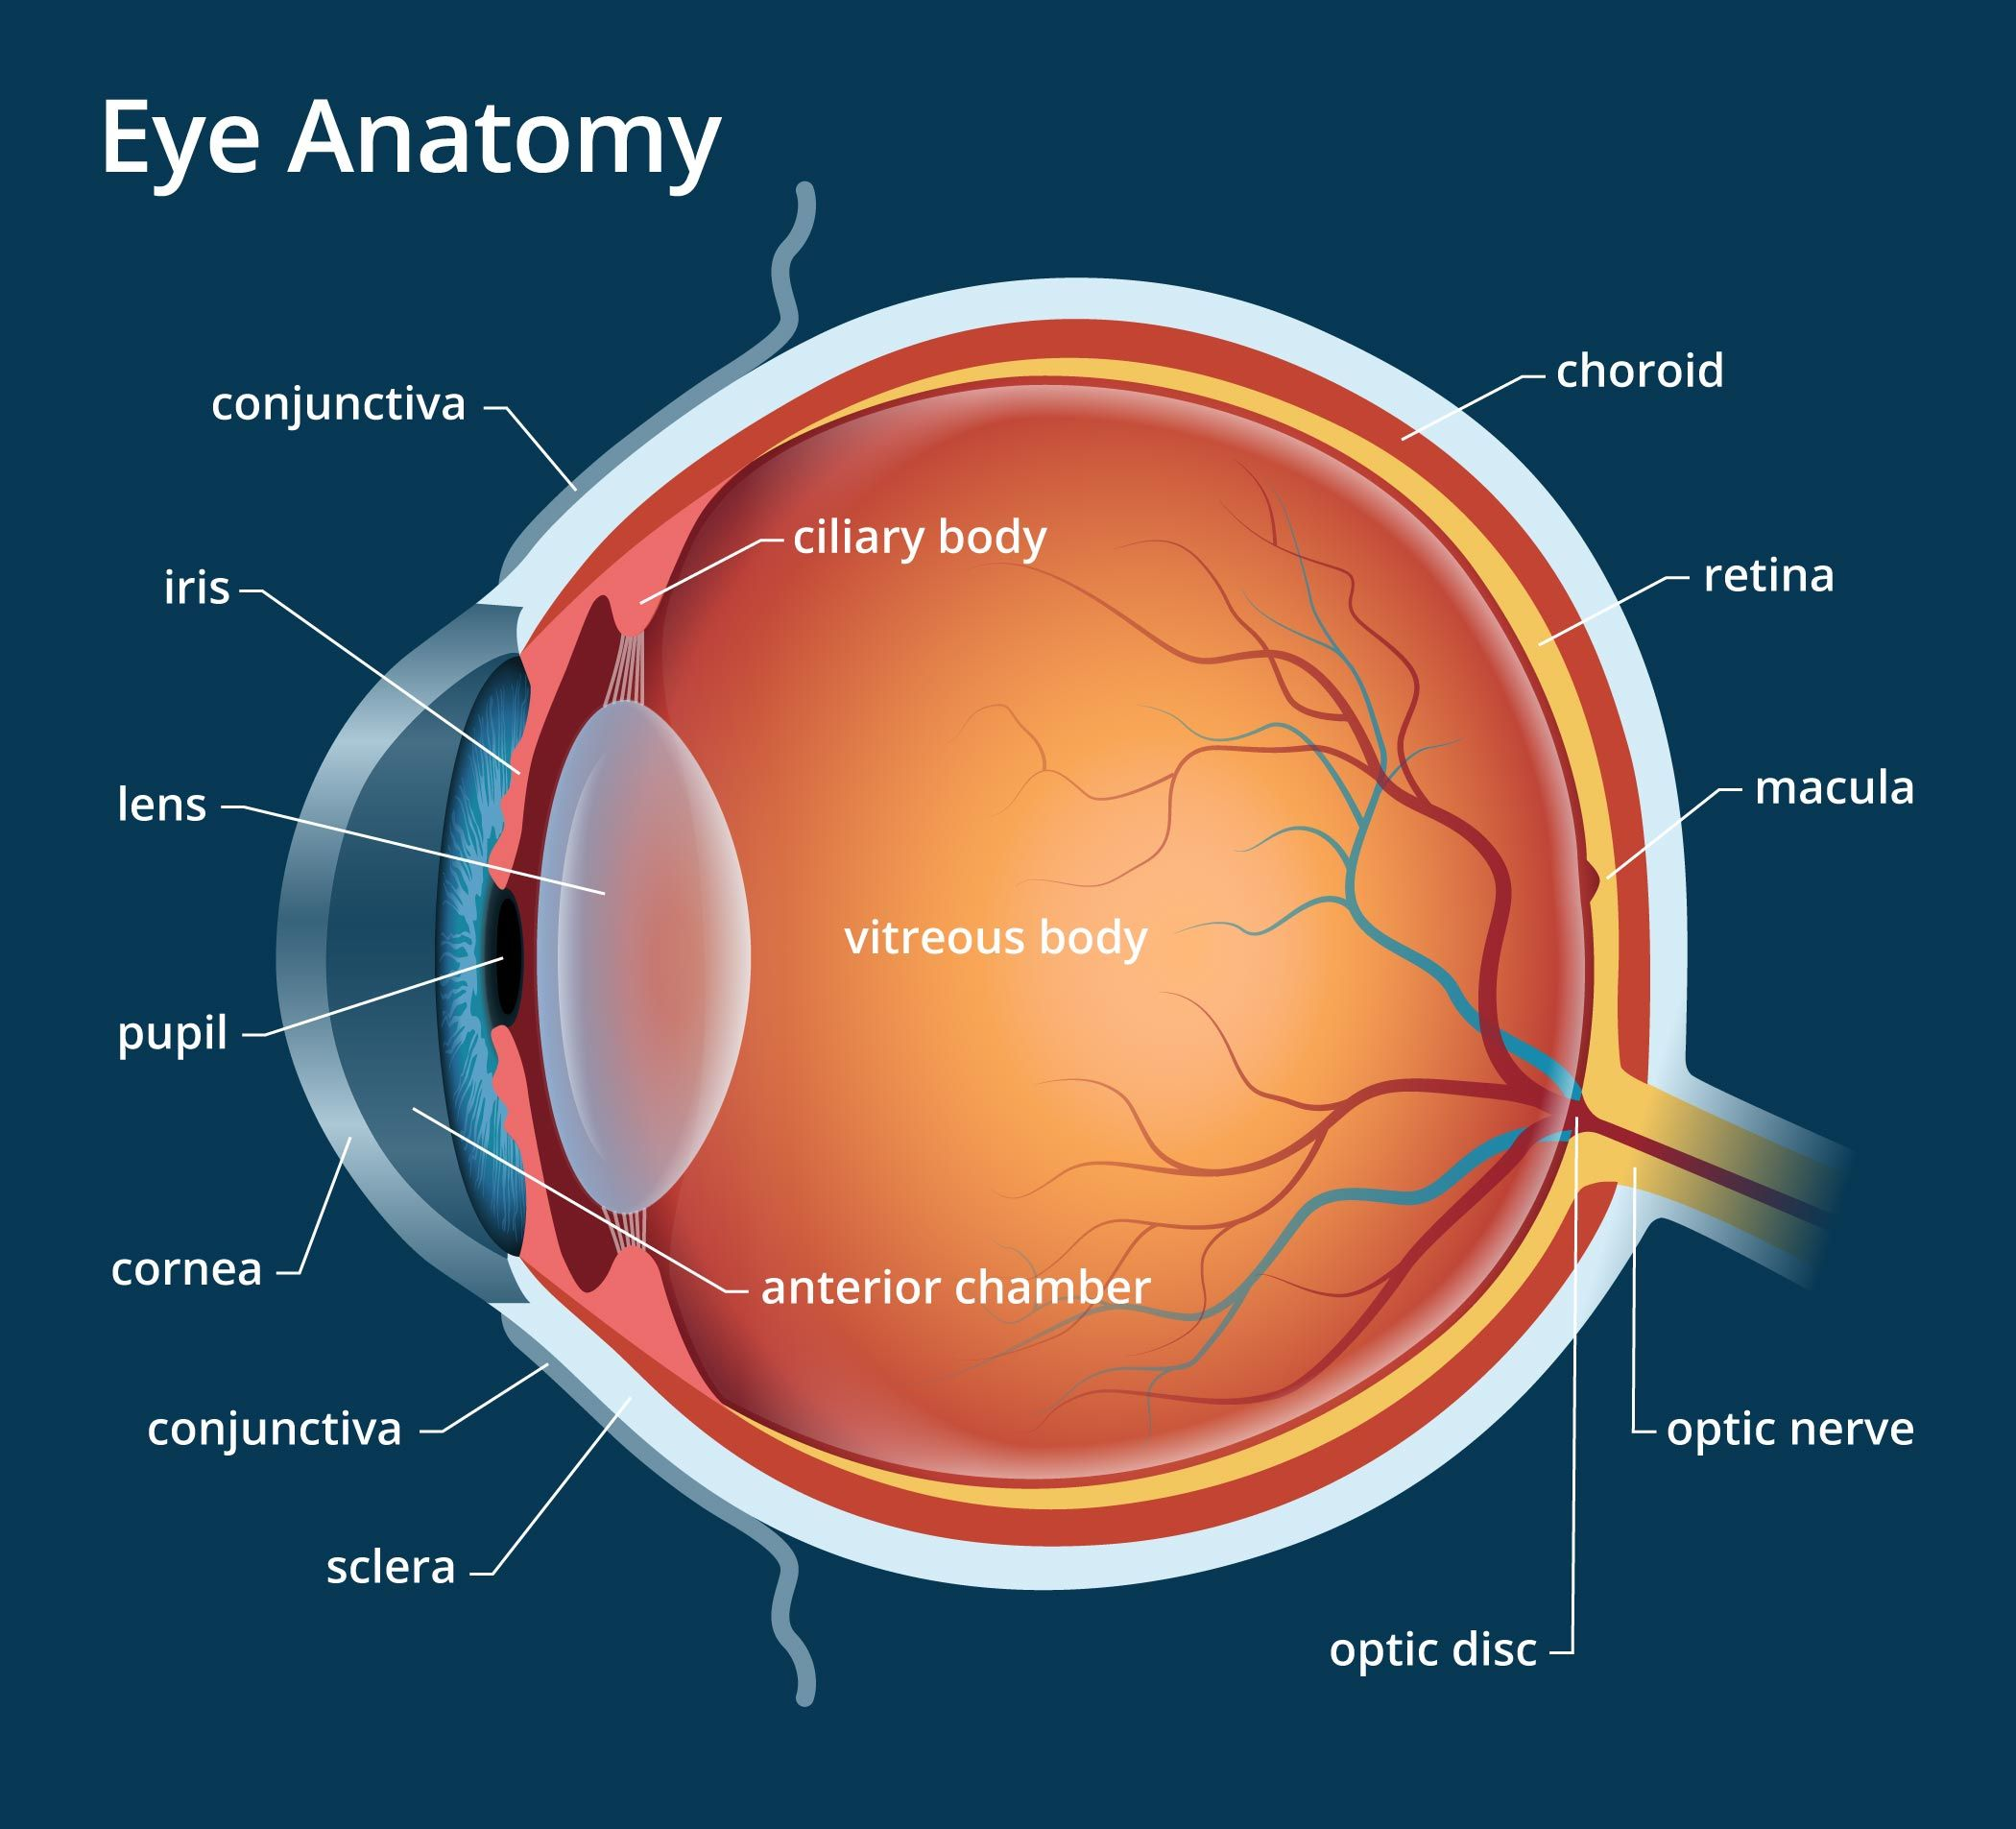 Human Eye Anatomy - Parts of the Eye Explained | Eye ...